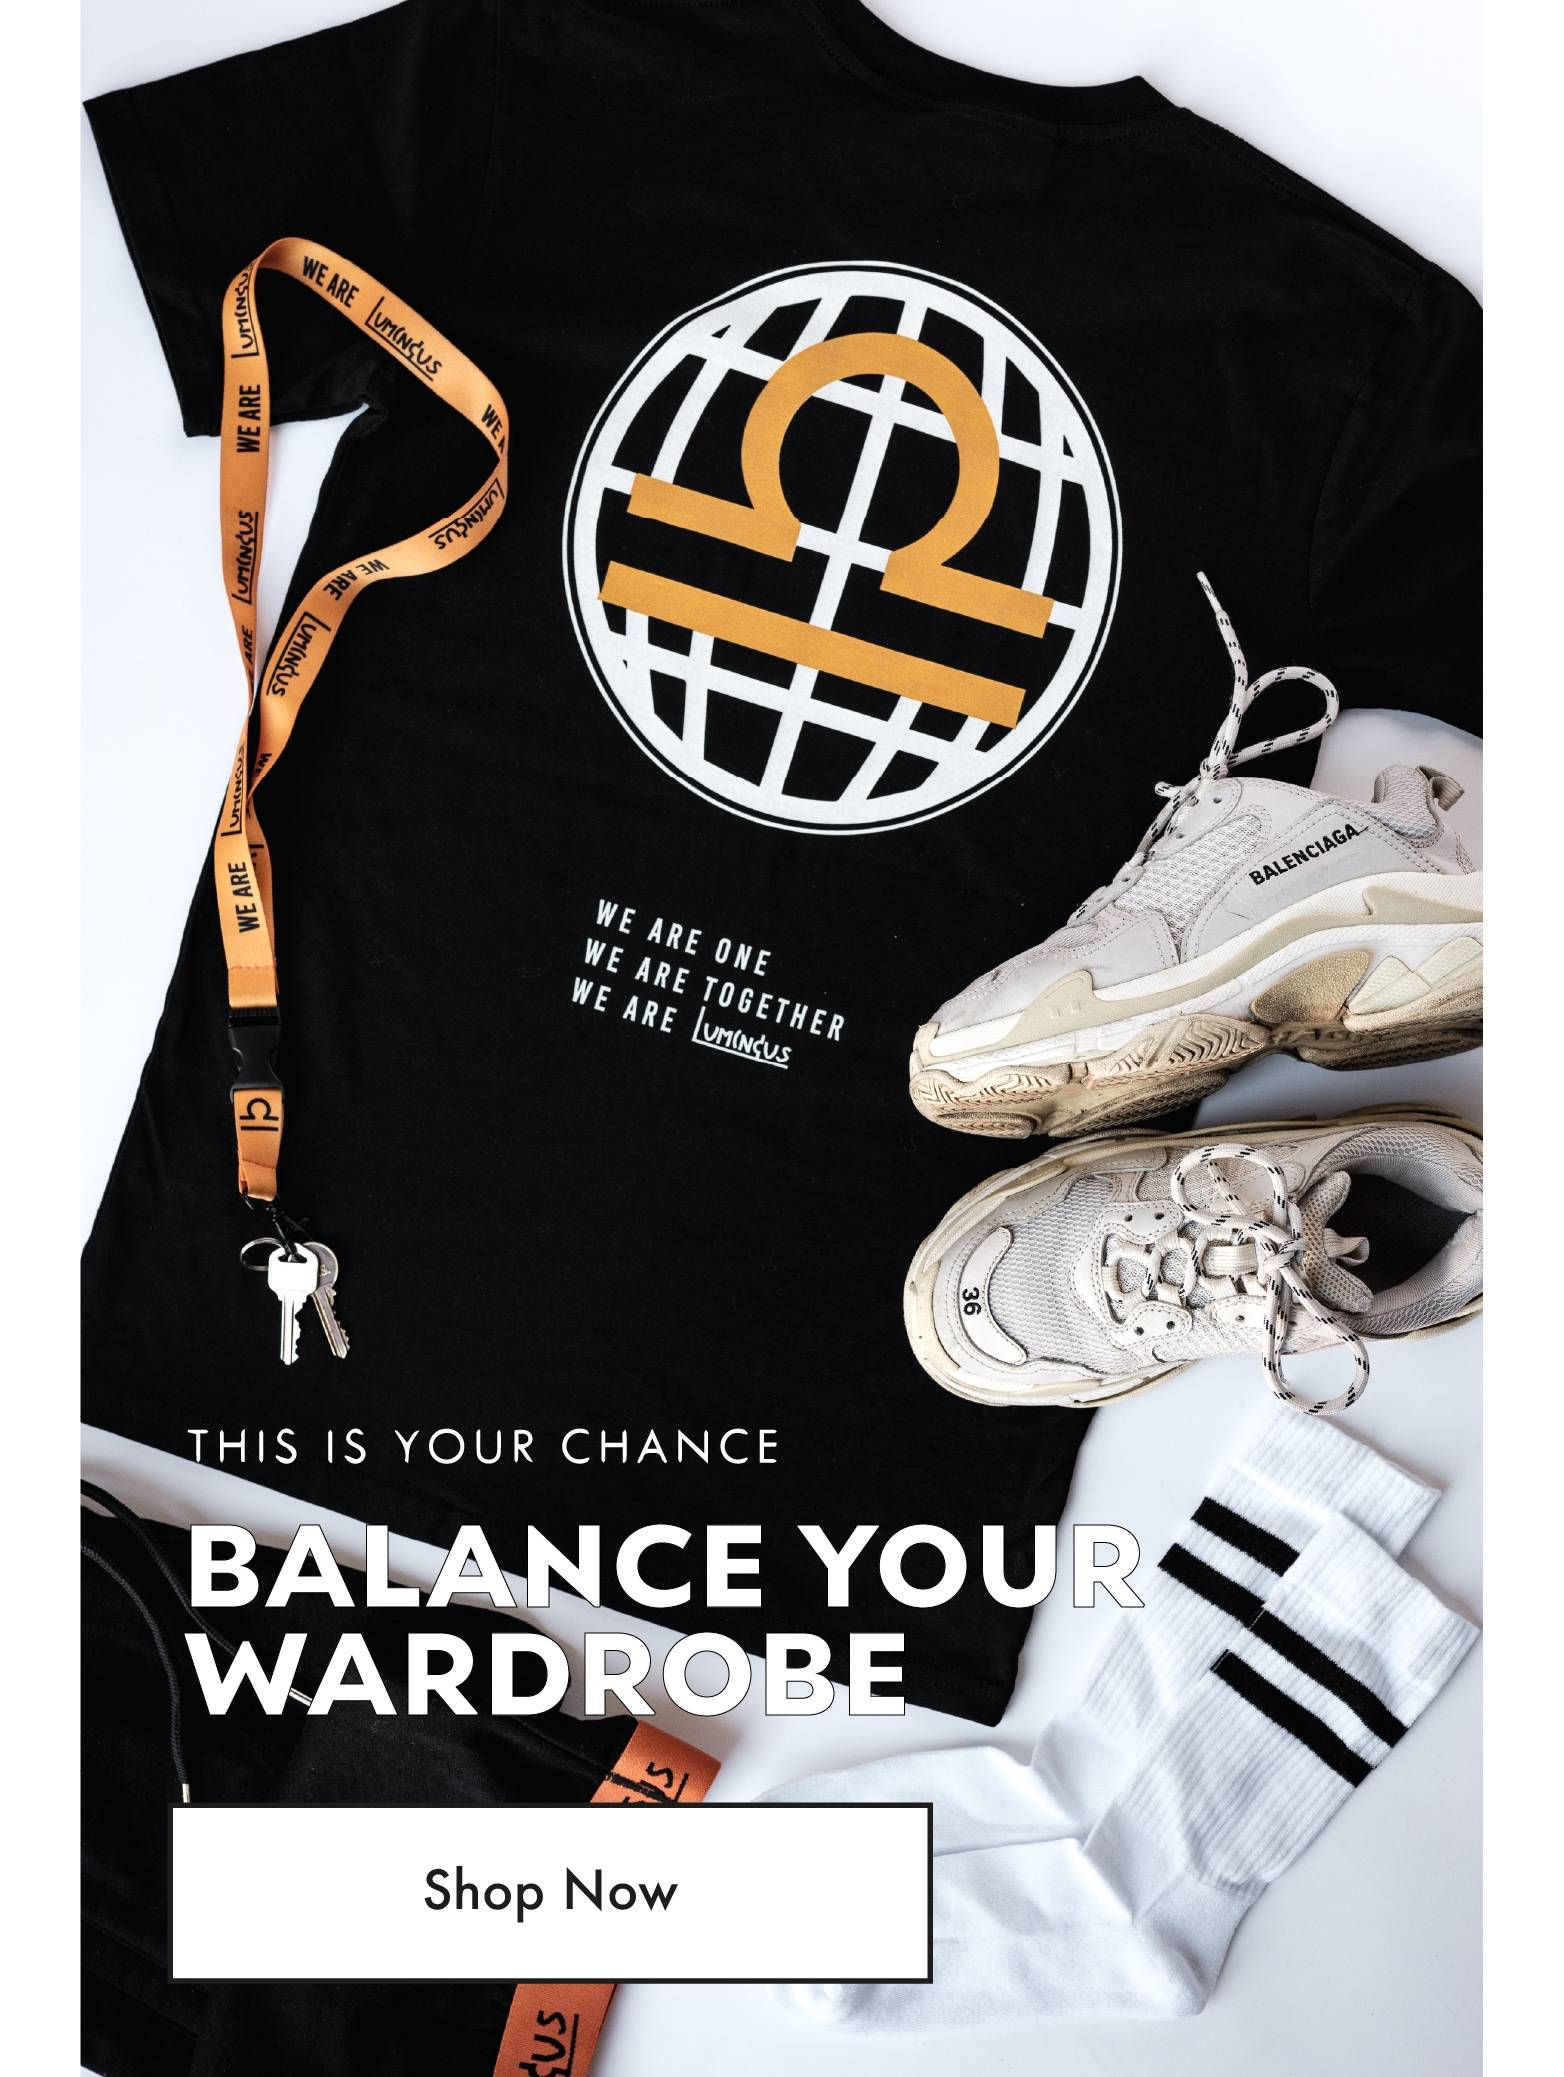 Balance Your Wardrobe - Shop Now